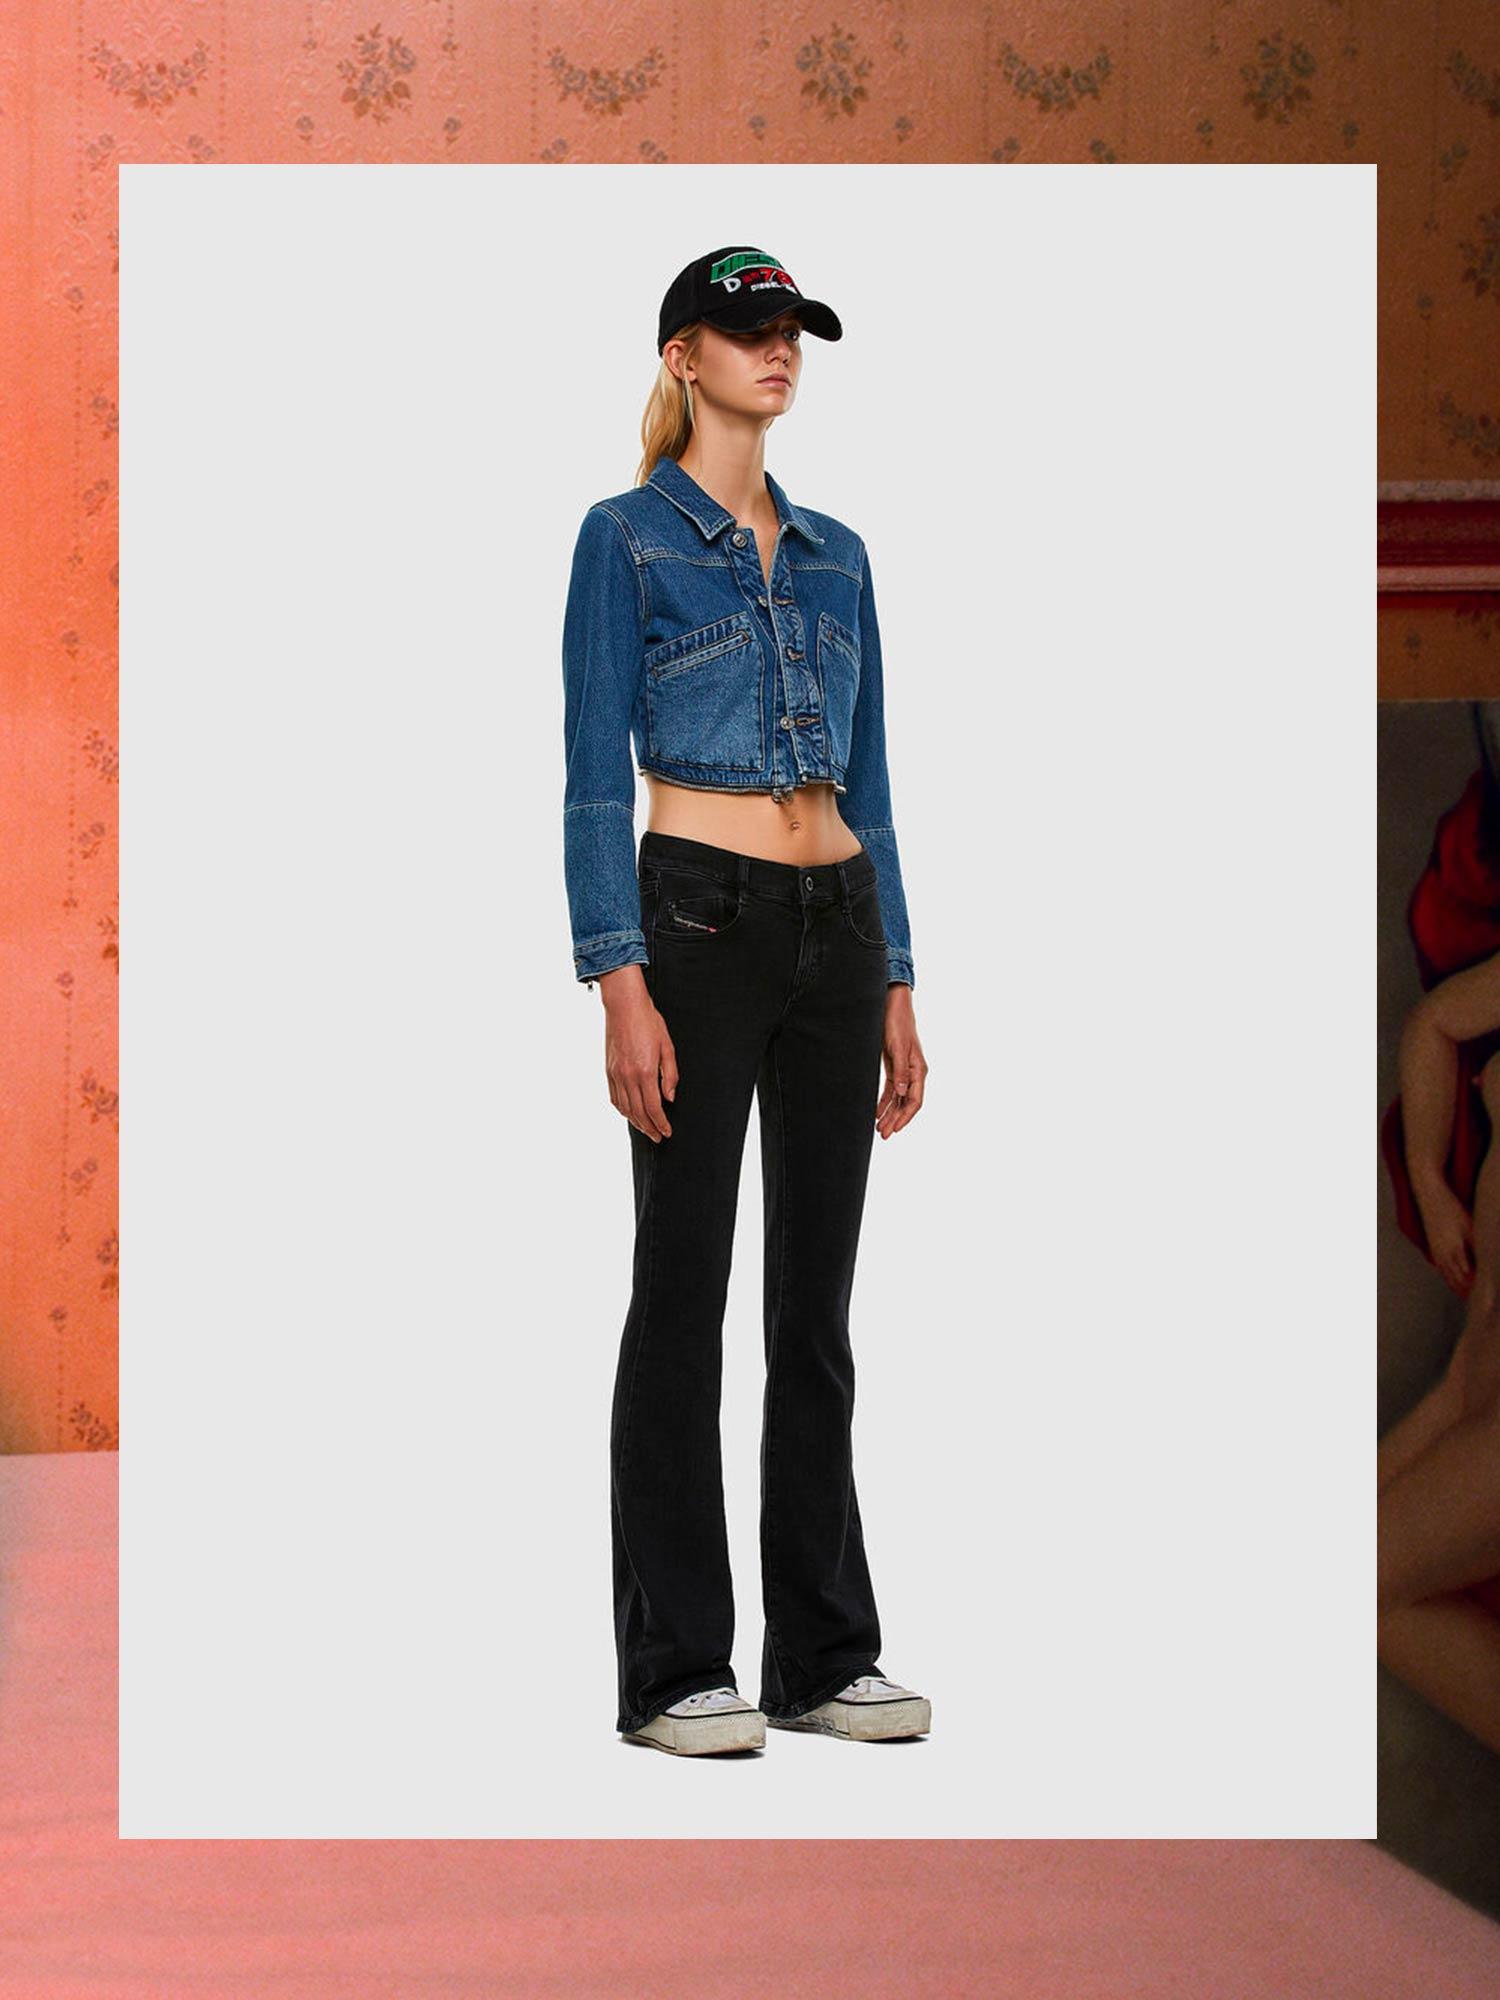 Diesel Jeans Bootcut Fit: D-Ebbey | Shop Now on Diesel.com